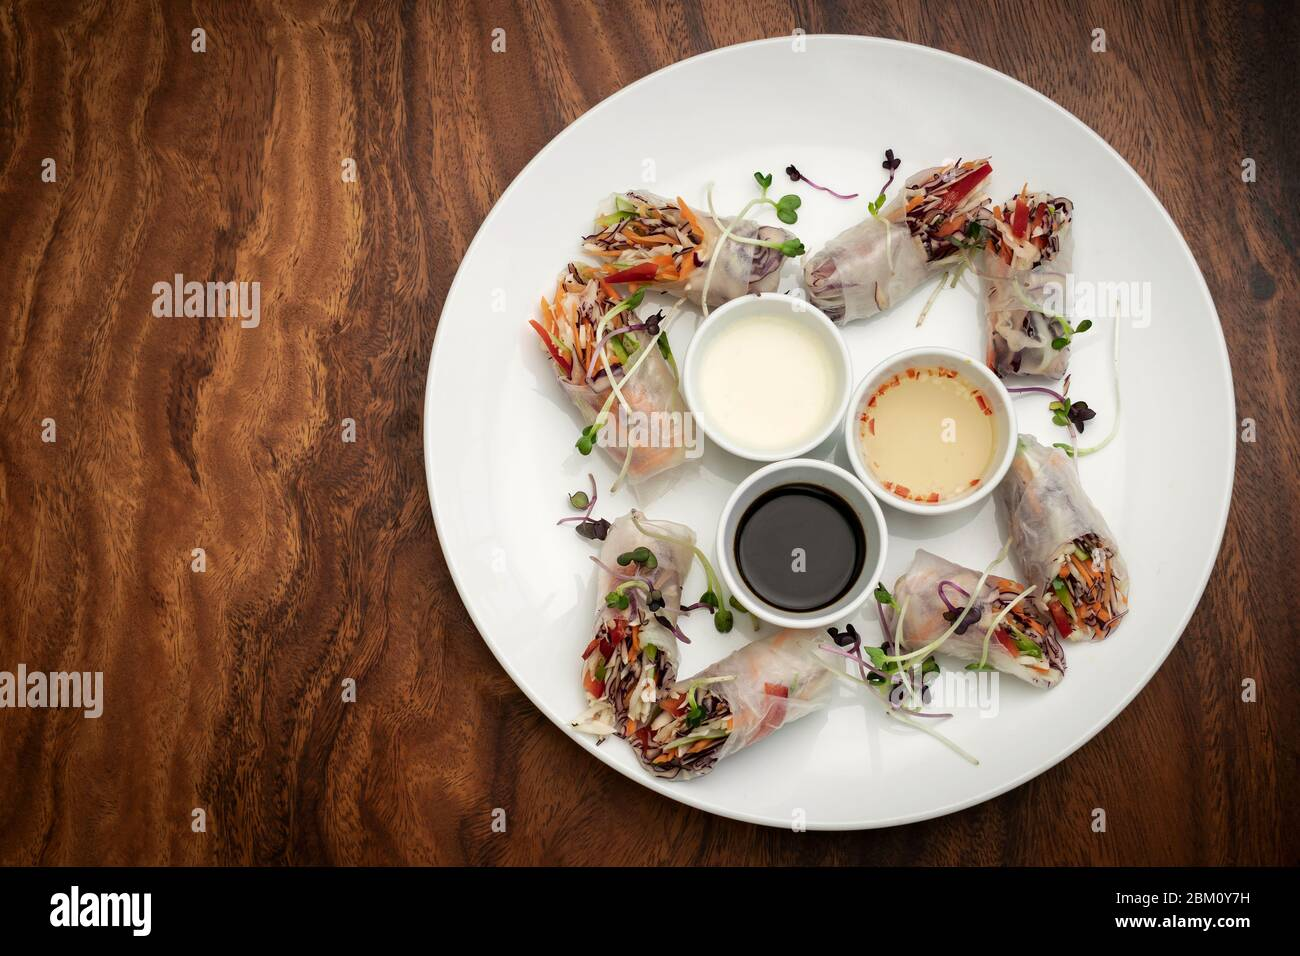 asian fresh vegetable vegan spring rolls with sauces on wood restaurant table in hanoi vietnam Stock Photo